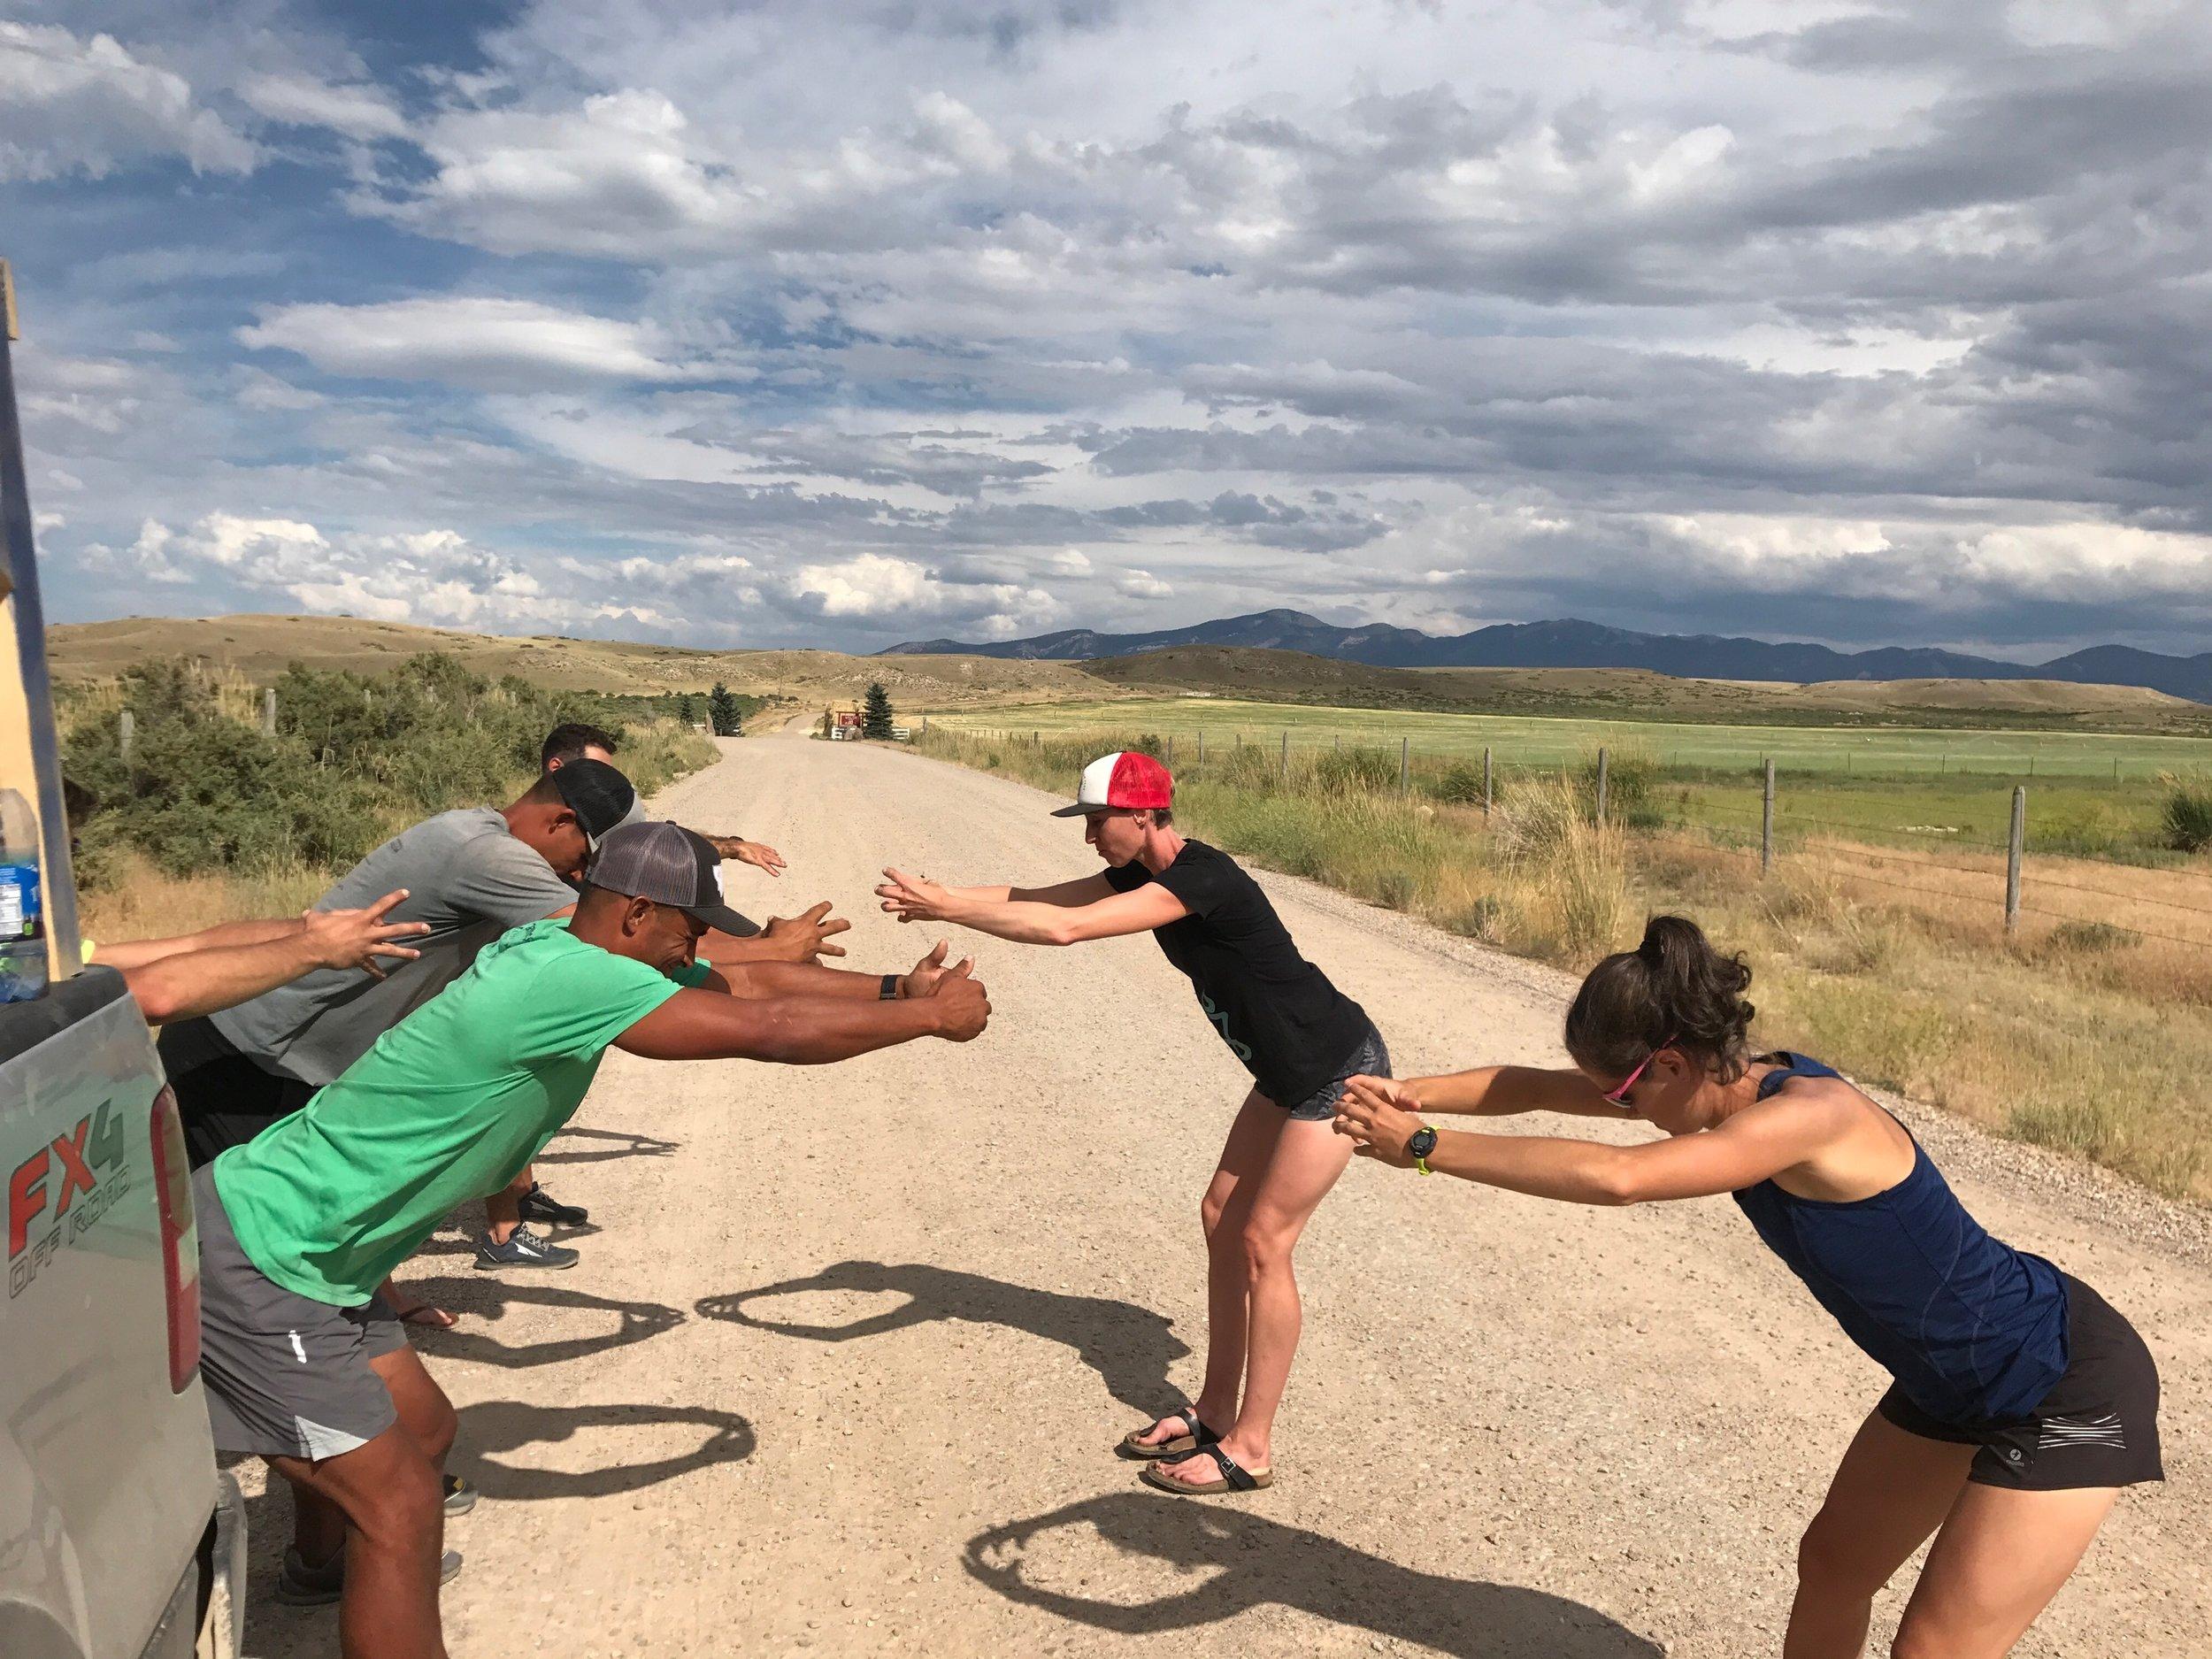 Heidi teaching Foundations between legs of a race. Photo by Caleb Ransom.